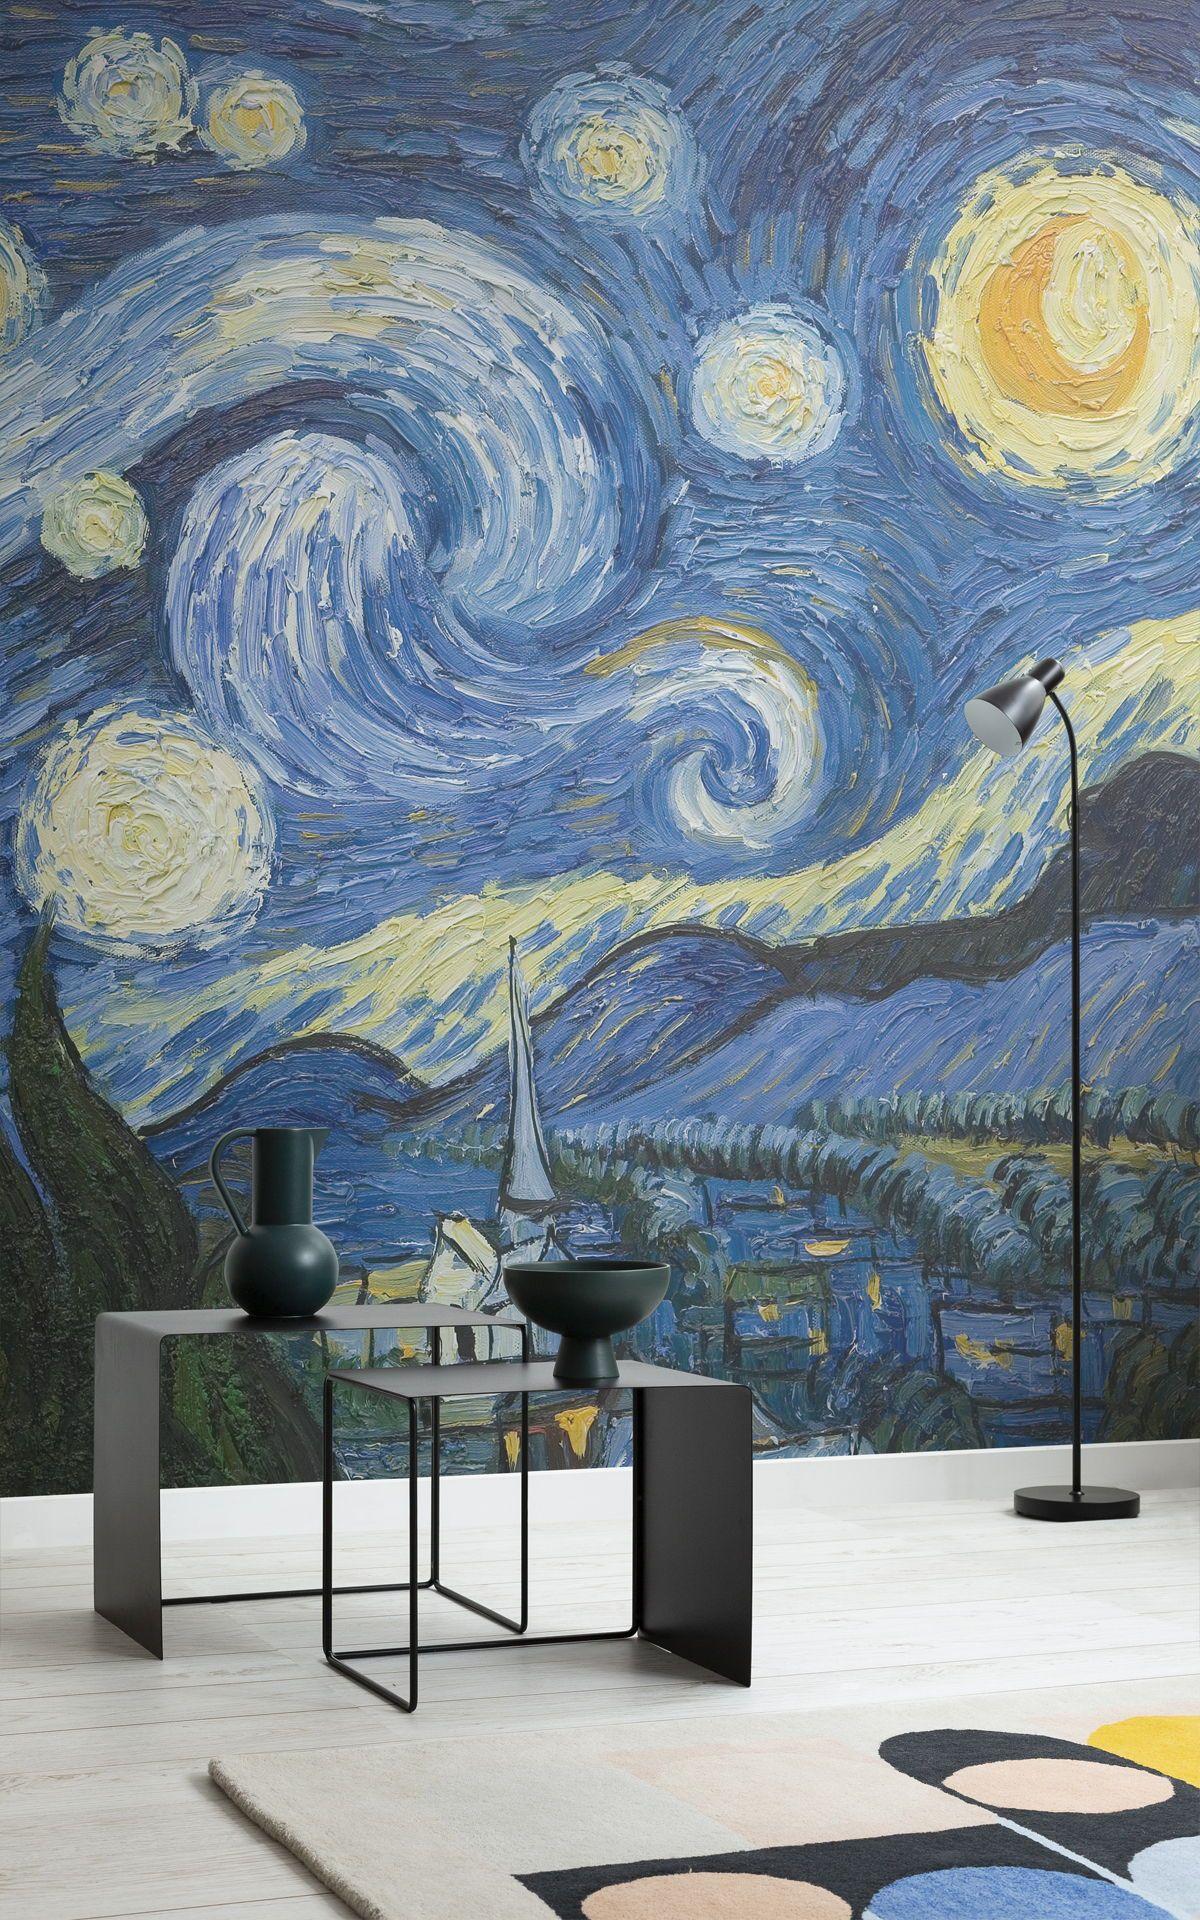 Starry Night Wallpaper Van Gogh Wallpaper For Walls Muralswallpaper In 2021 Starry Night Van Gogh Starry Night Wallpaper Art Wallpaper